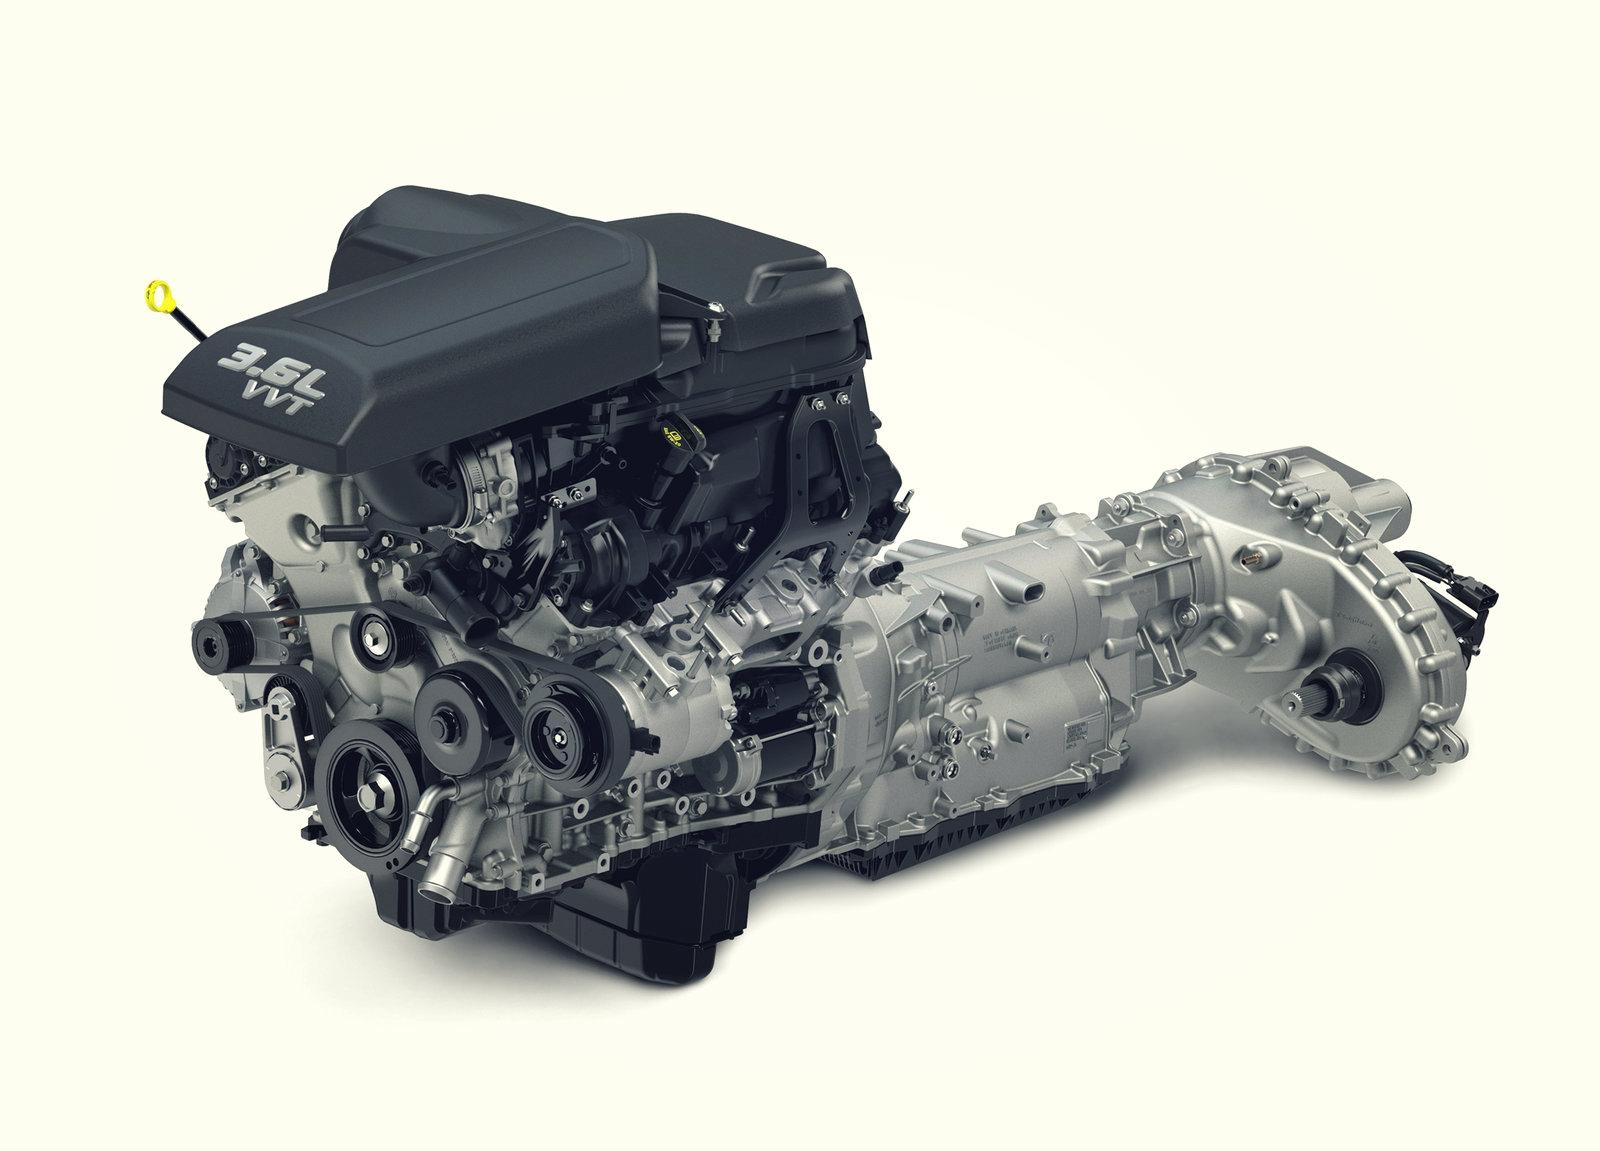 hight resolution of 3 6 pentastar engine charger diagram wiring diagram used 3 6 liter engine diagram